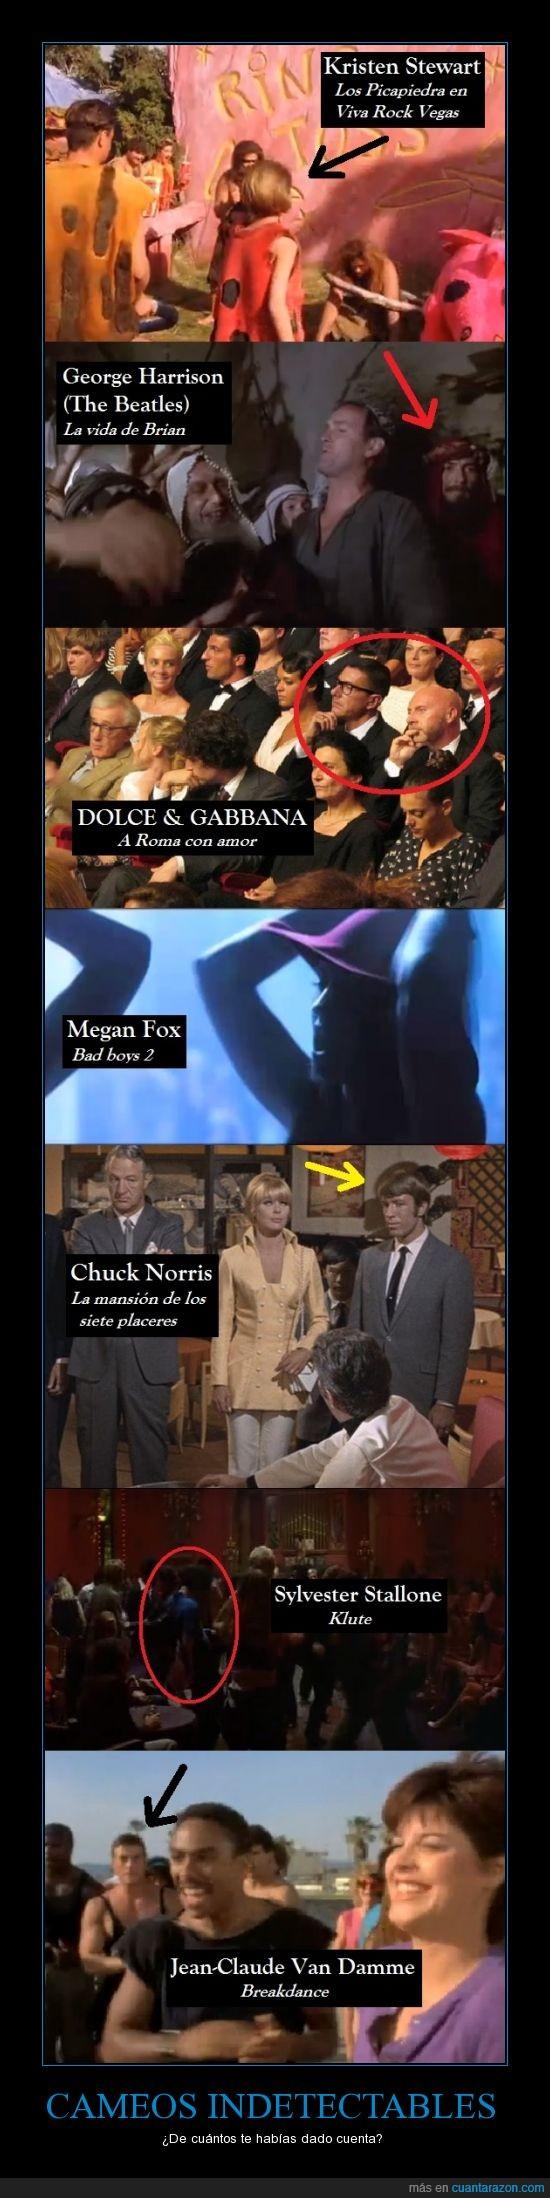 Beatles,Cameo,Chuck Norris,george harrison,Megan Fox,Monty Python,Picapiedra,Van Damme